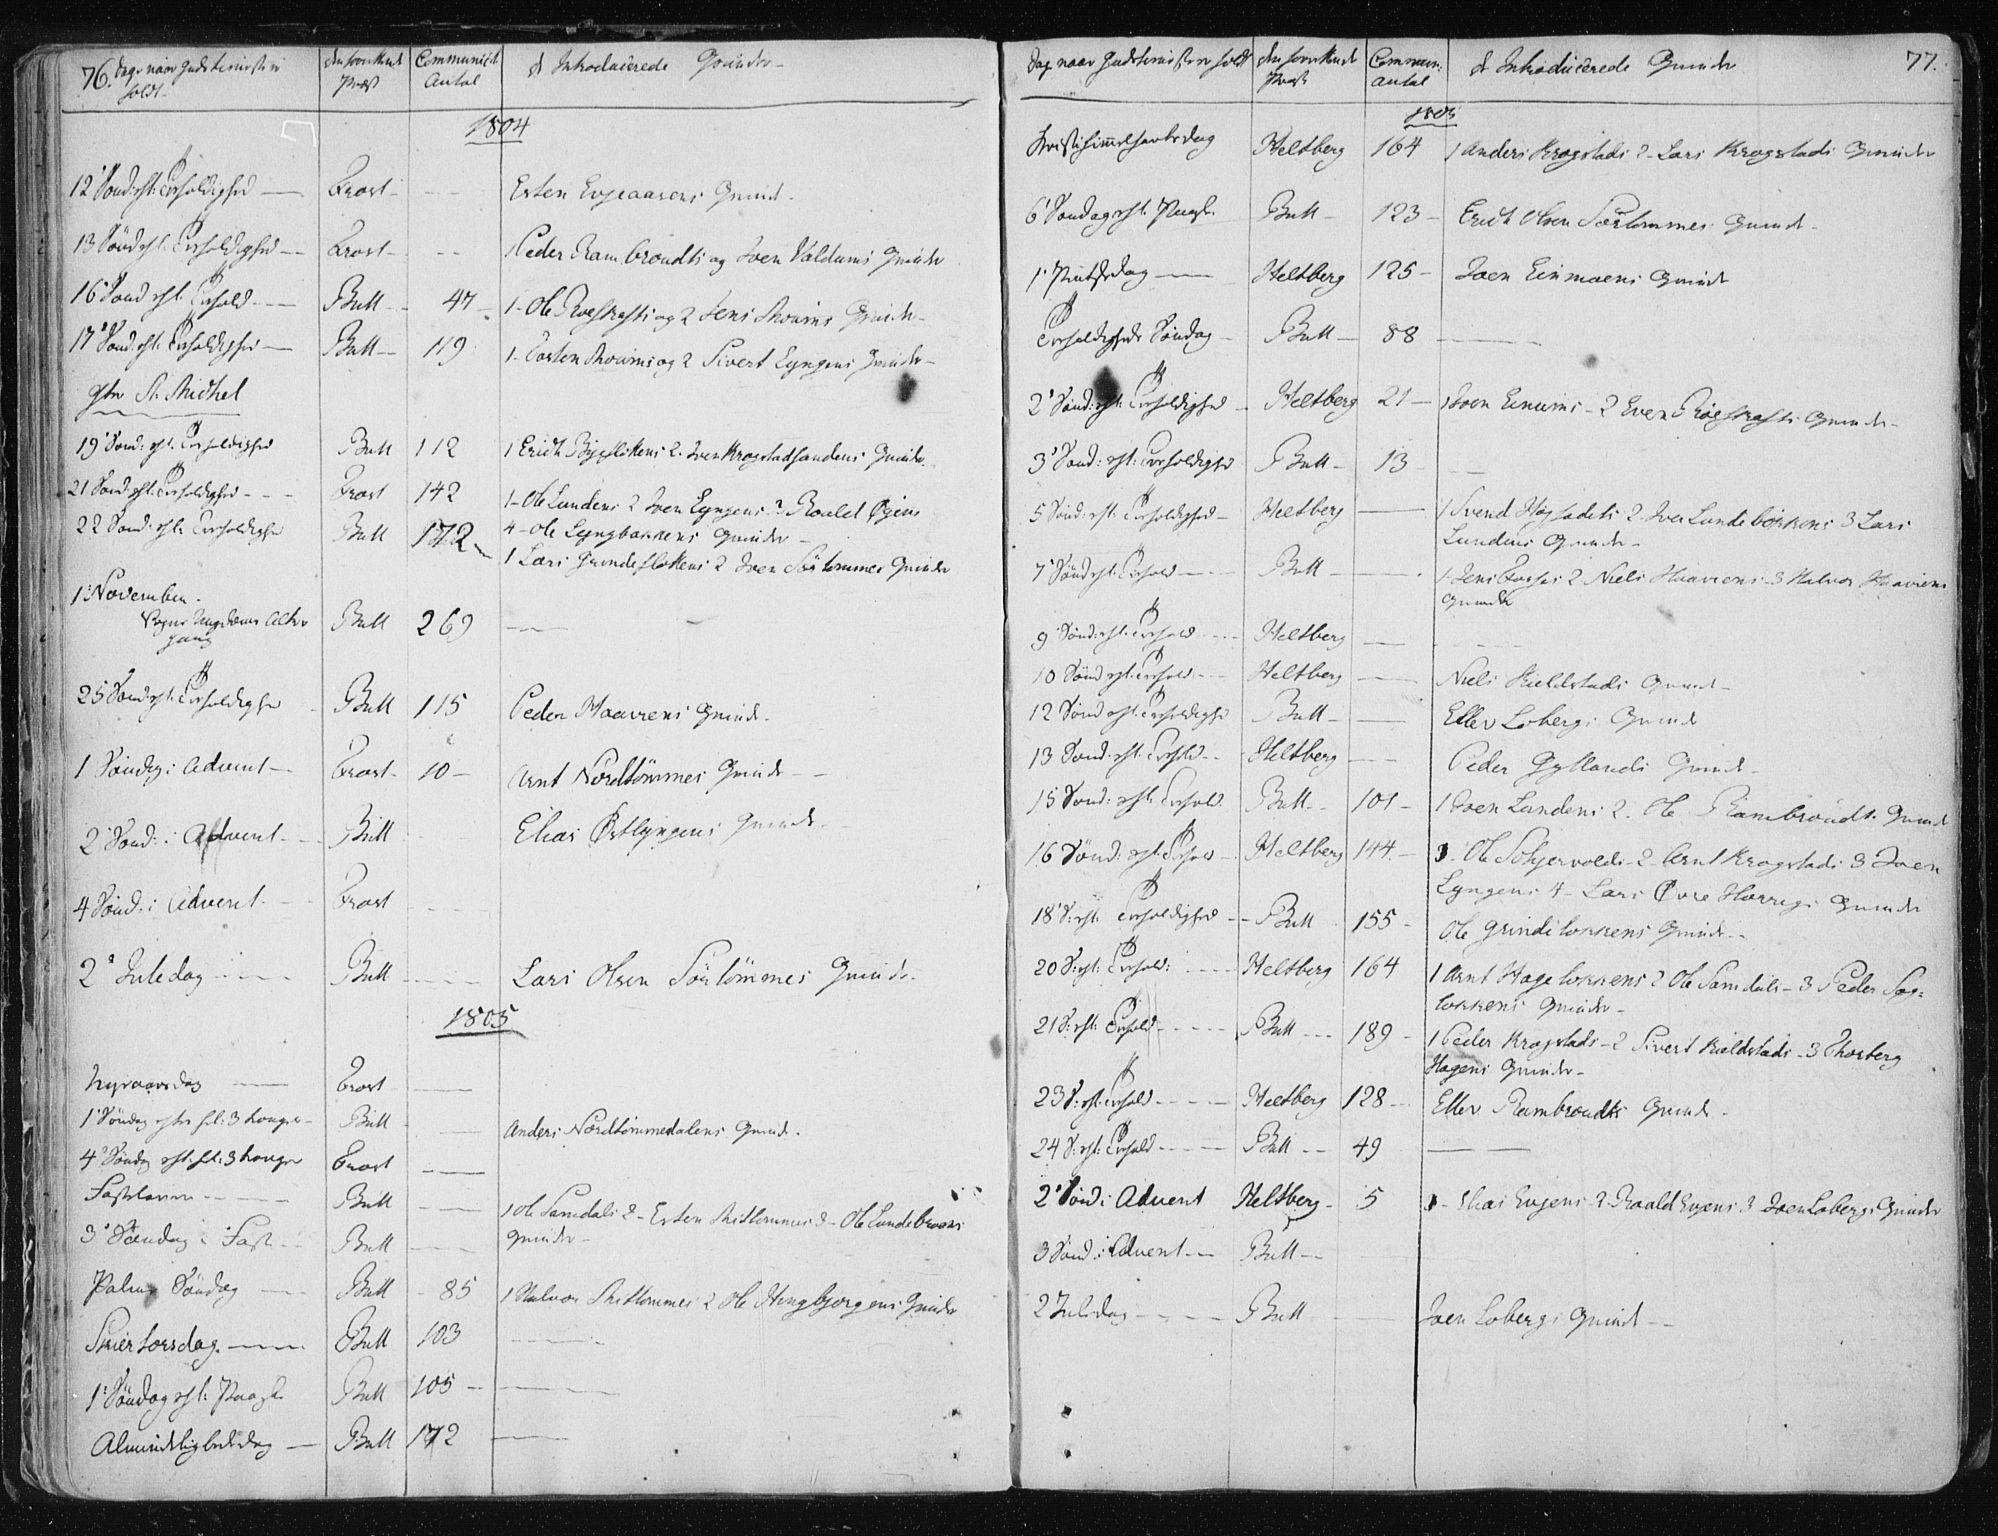 SAT, Ministerialprotokoller, klokkerbøker og fødselsregistre - Sør-Trøndelag, 687/L0993: Parish register (official) no. 687A03 /2, 1788-1815, p. 76-77